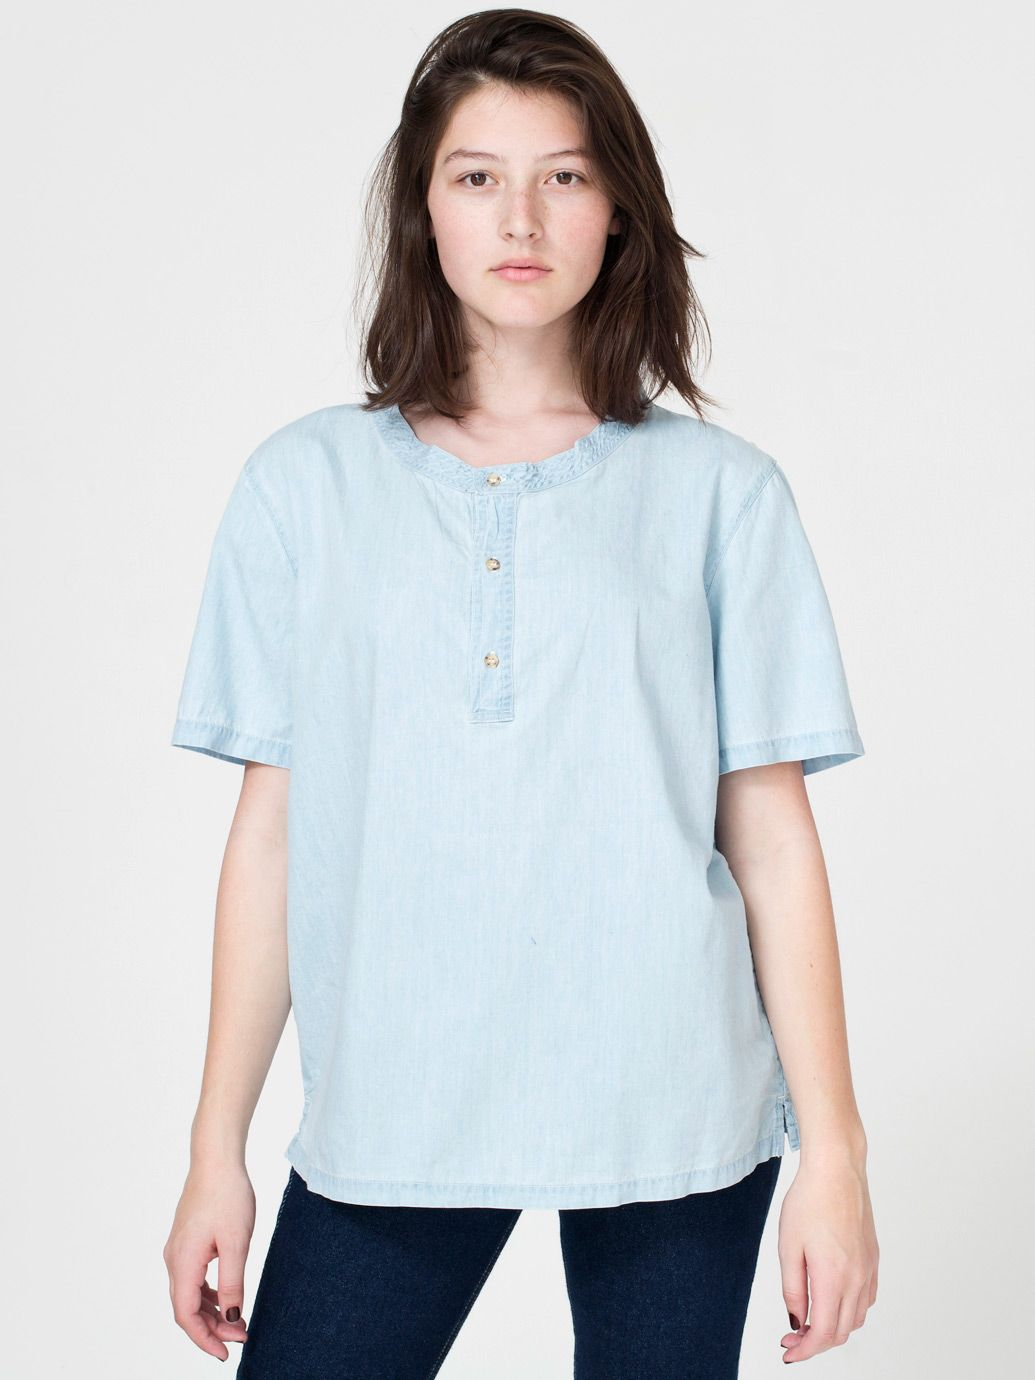 The Unisex Denim Short Sleeve Henley T-Shirt by #AmericanApparel  #denim #t-shirt #aamodels #alex